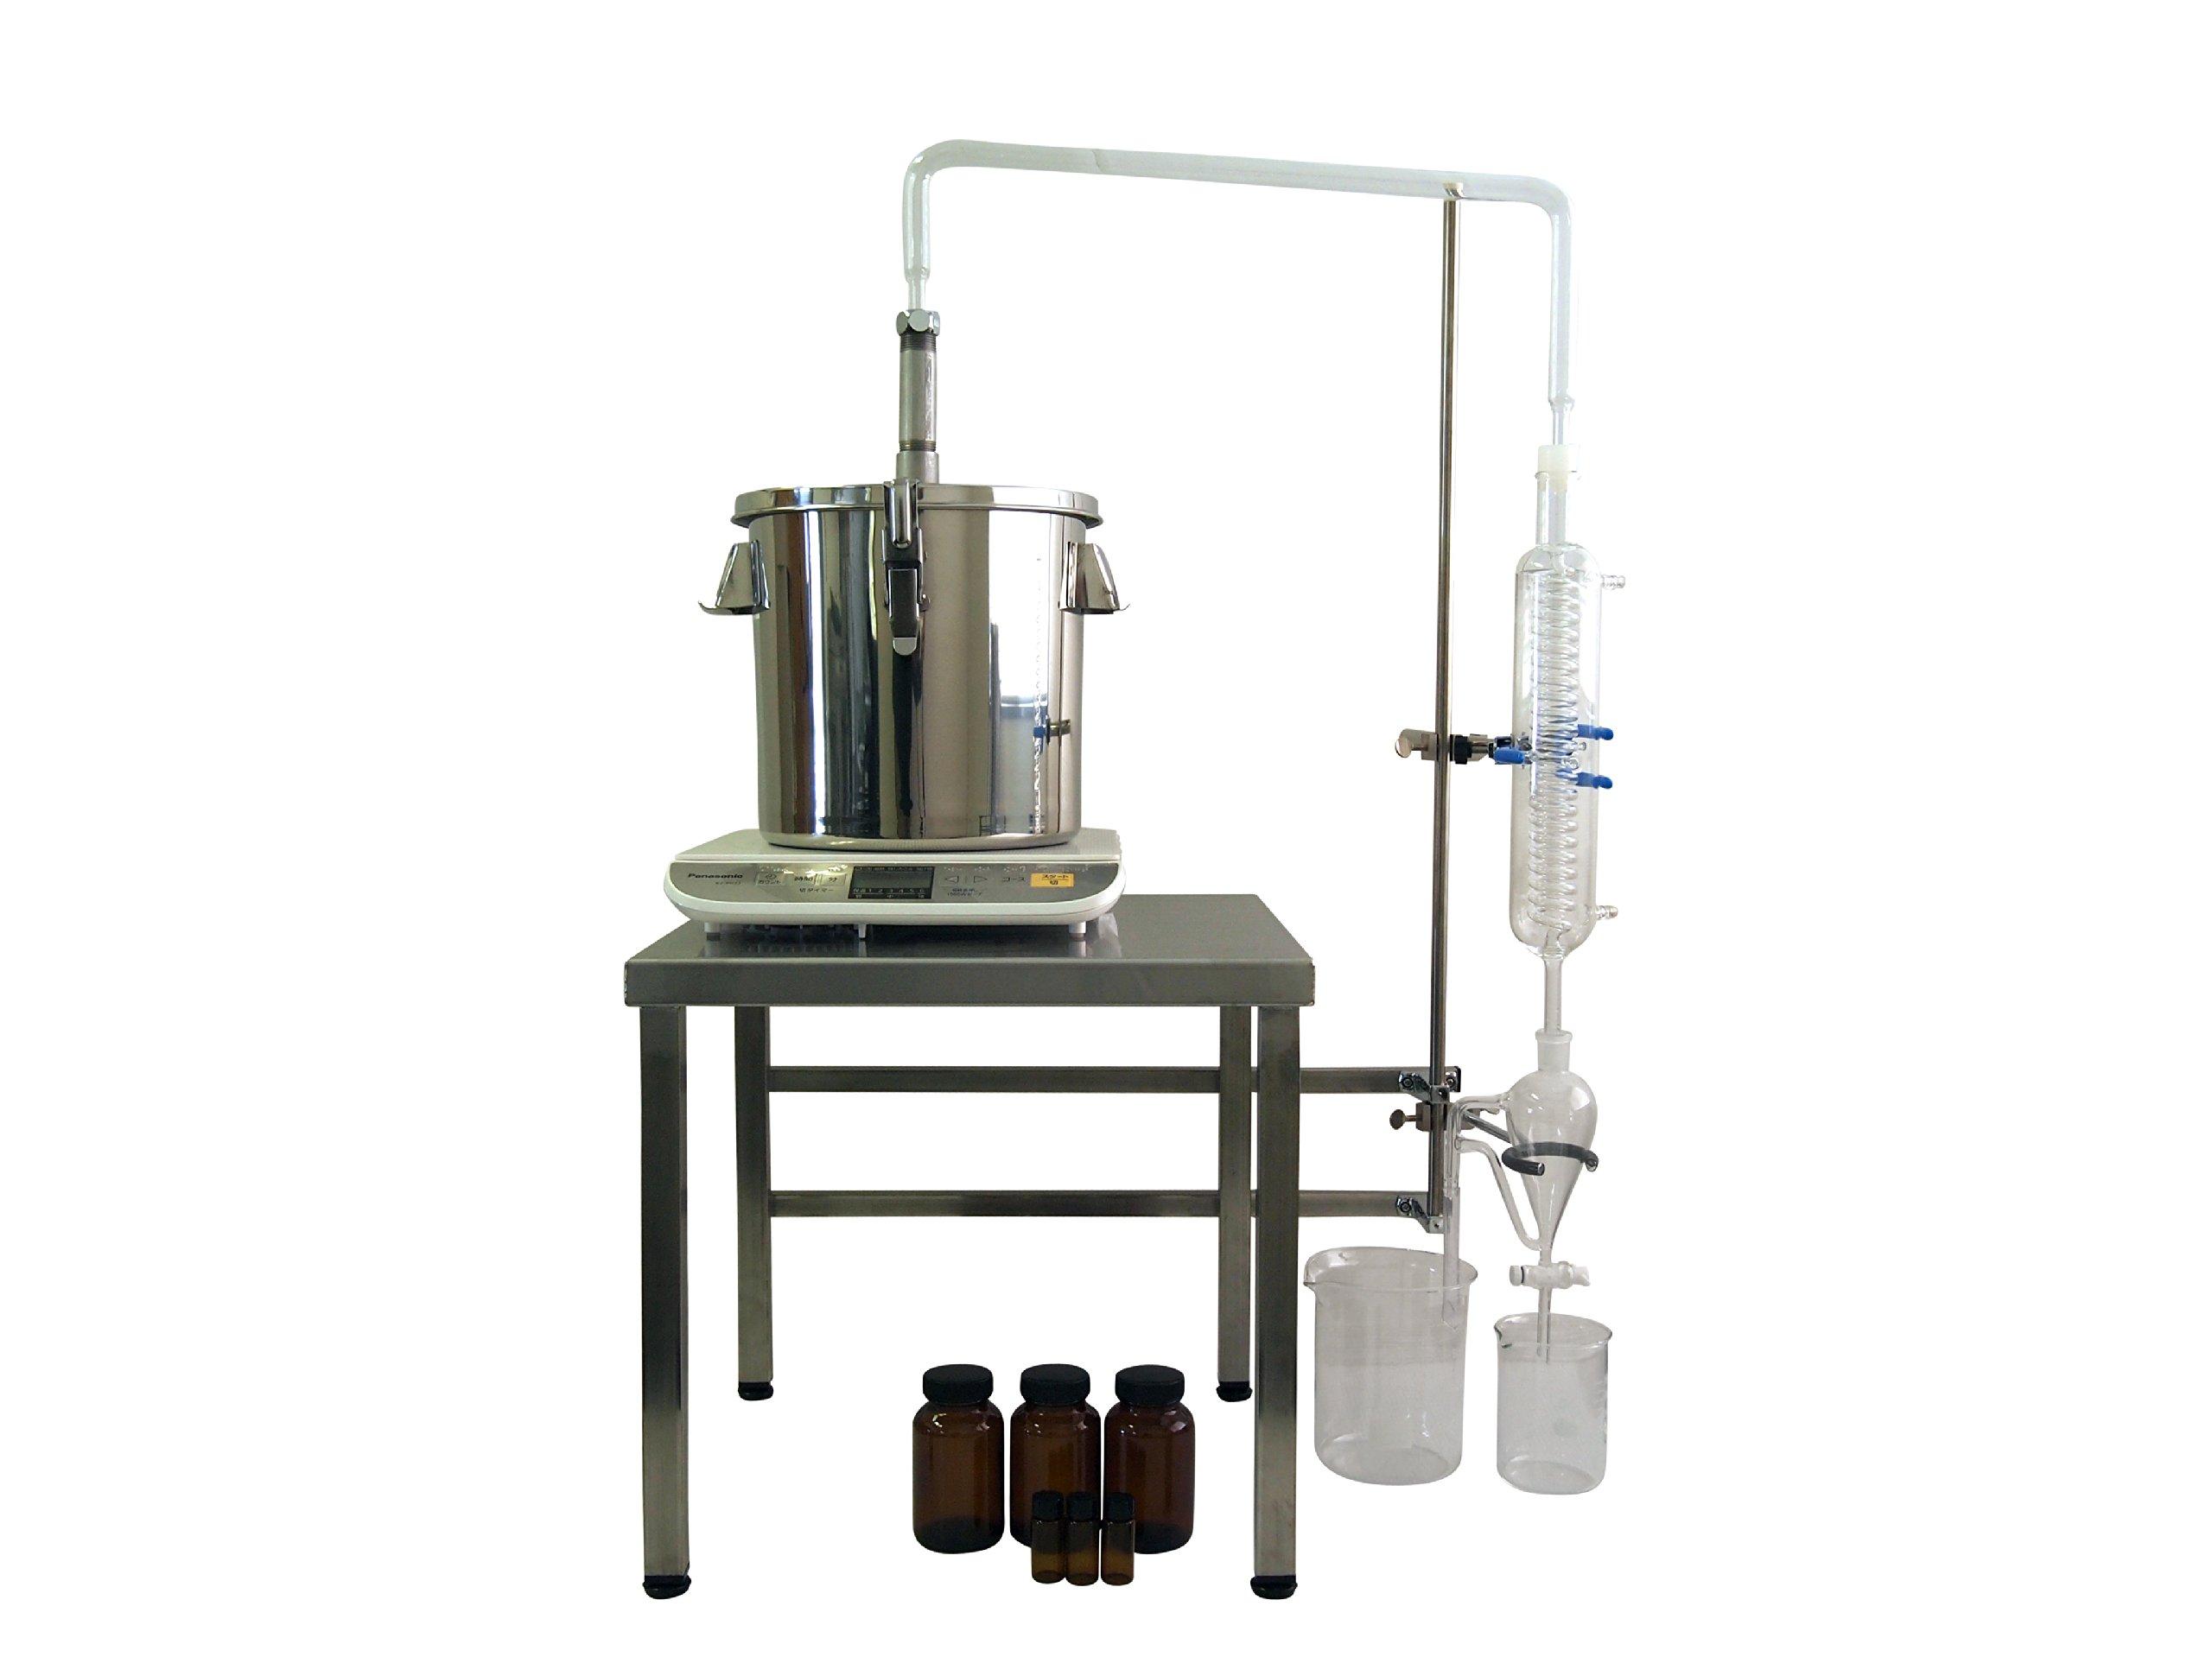 PureStiller HC/S Home Distillation Kit